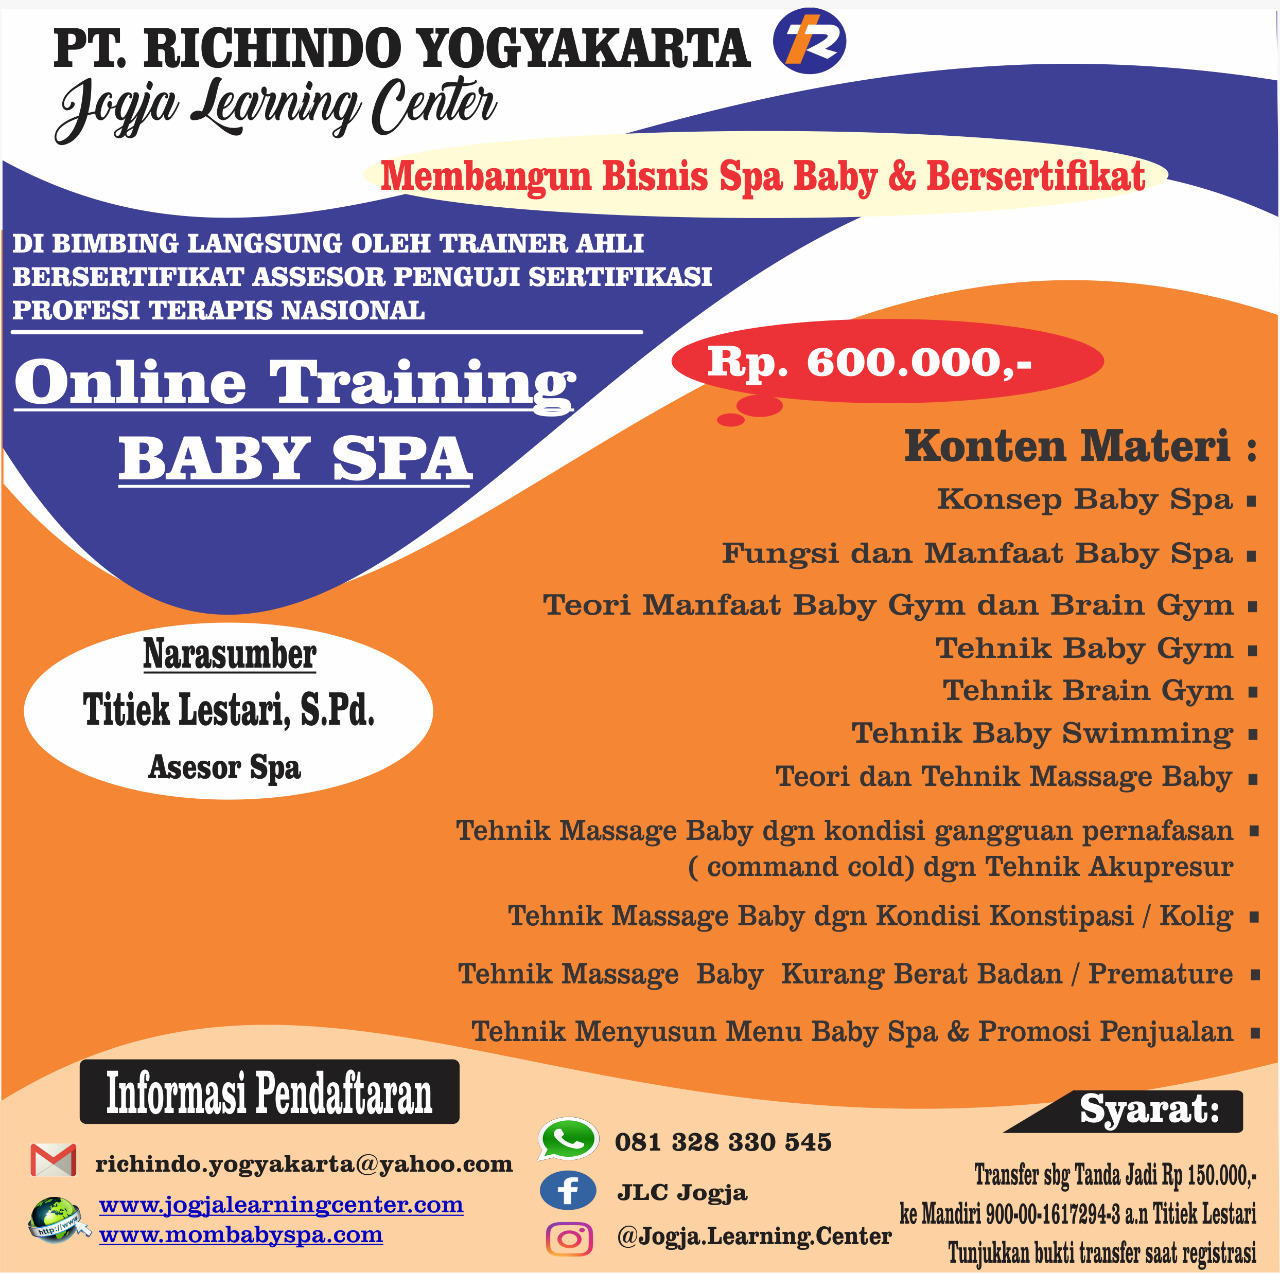 Pelatihan Online Training Baby Spa